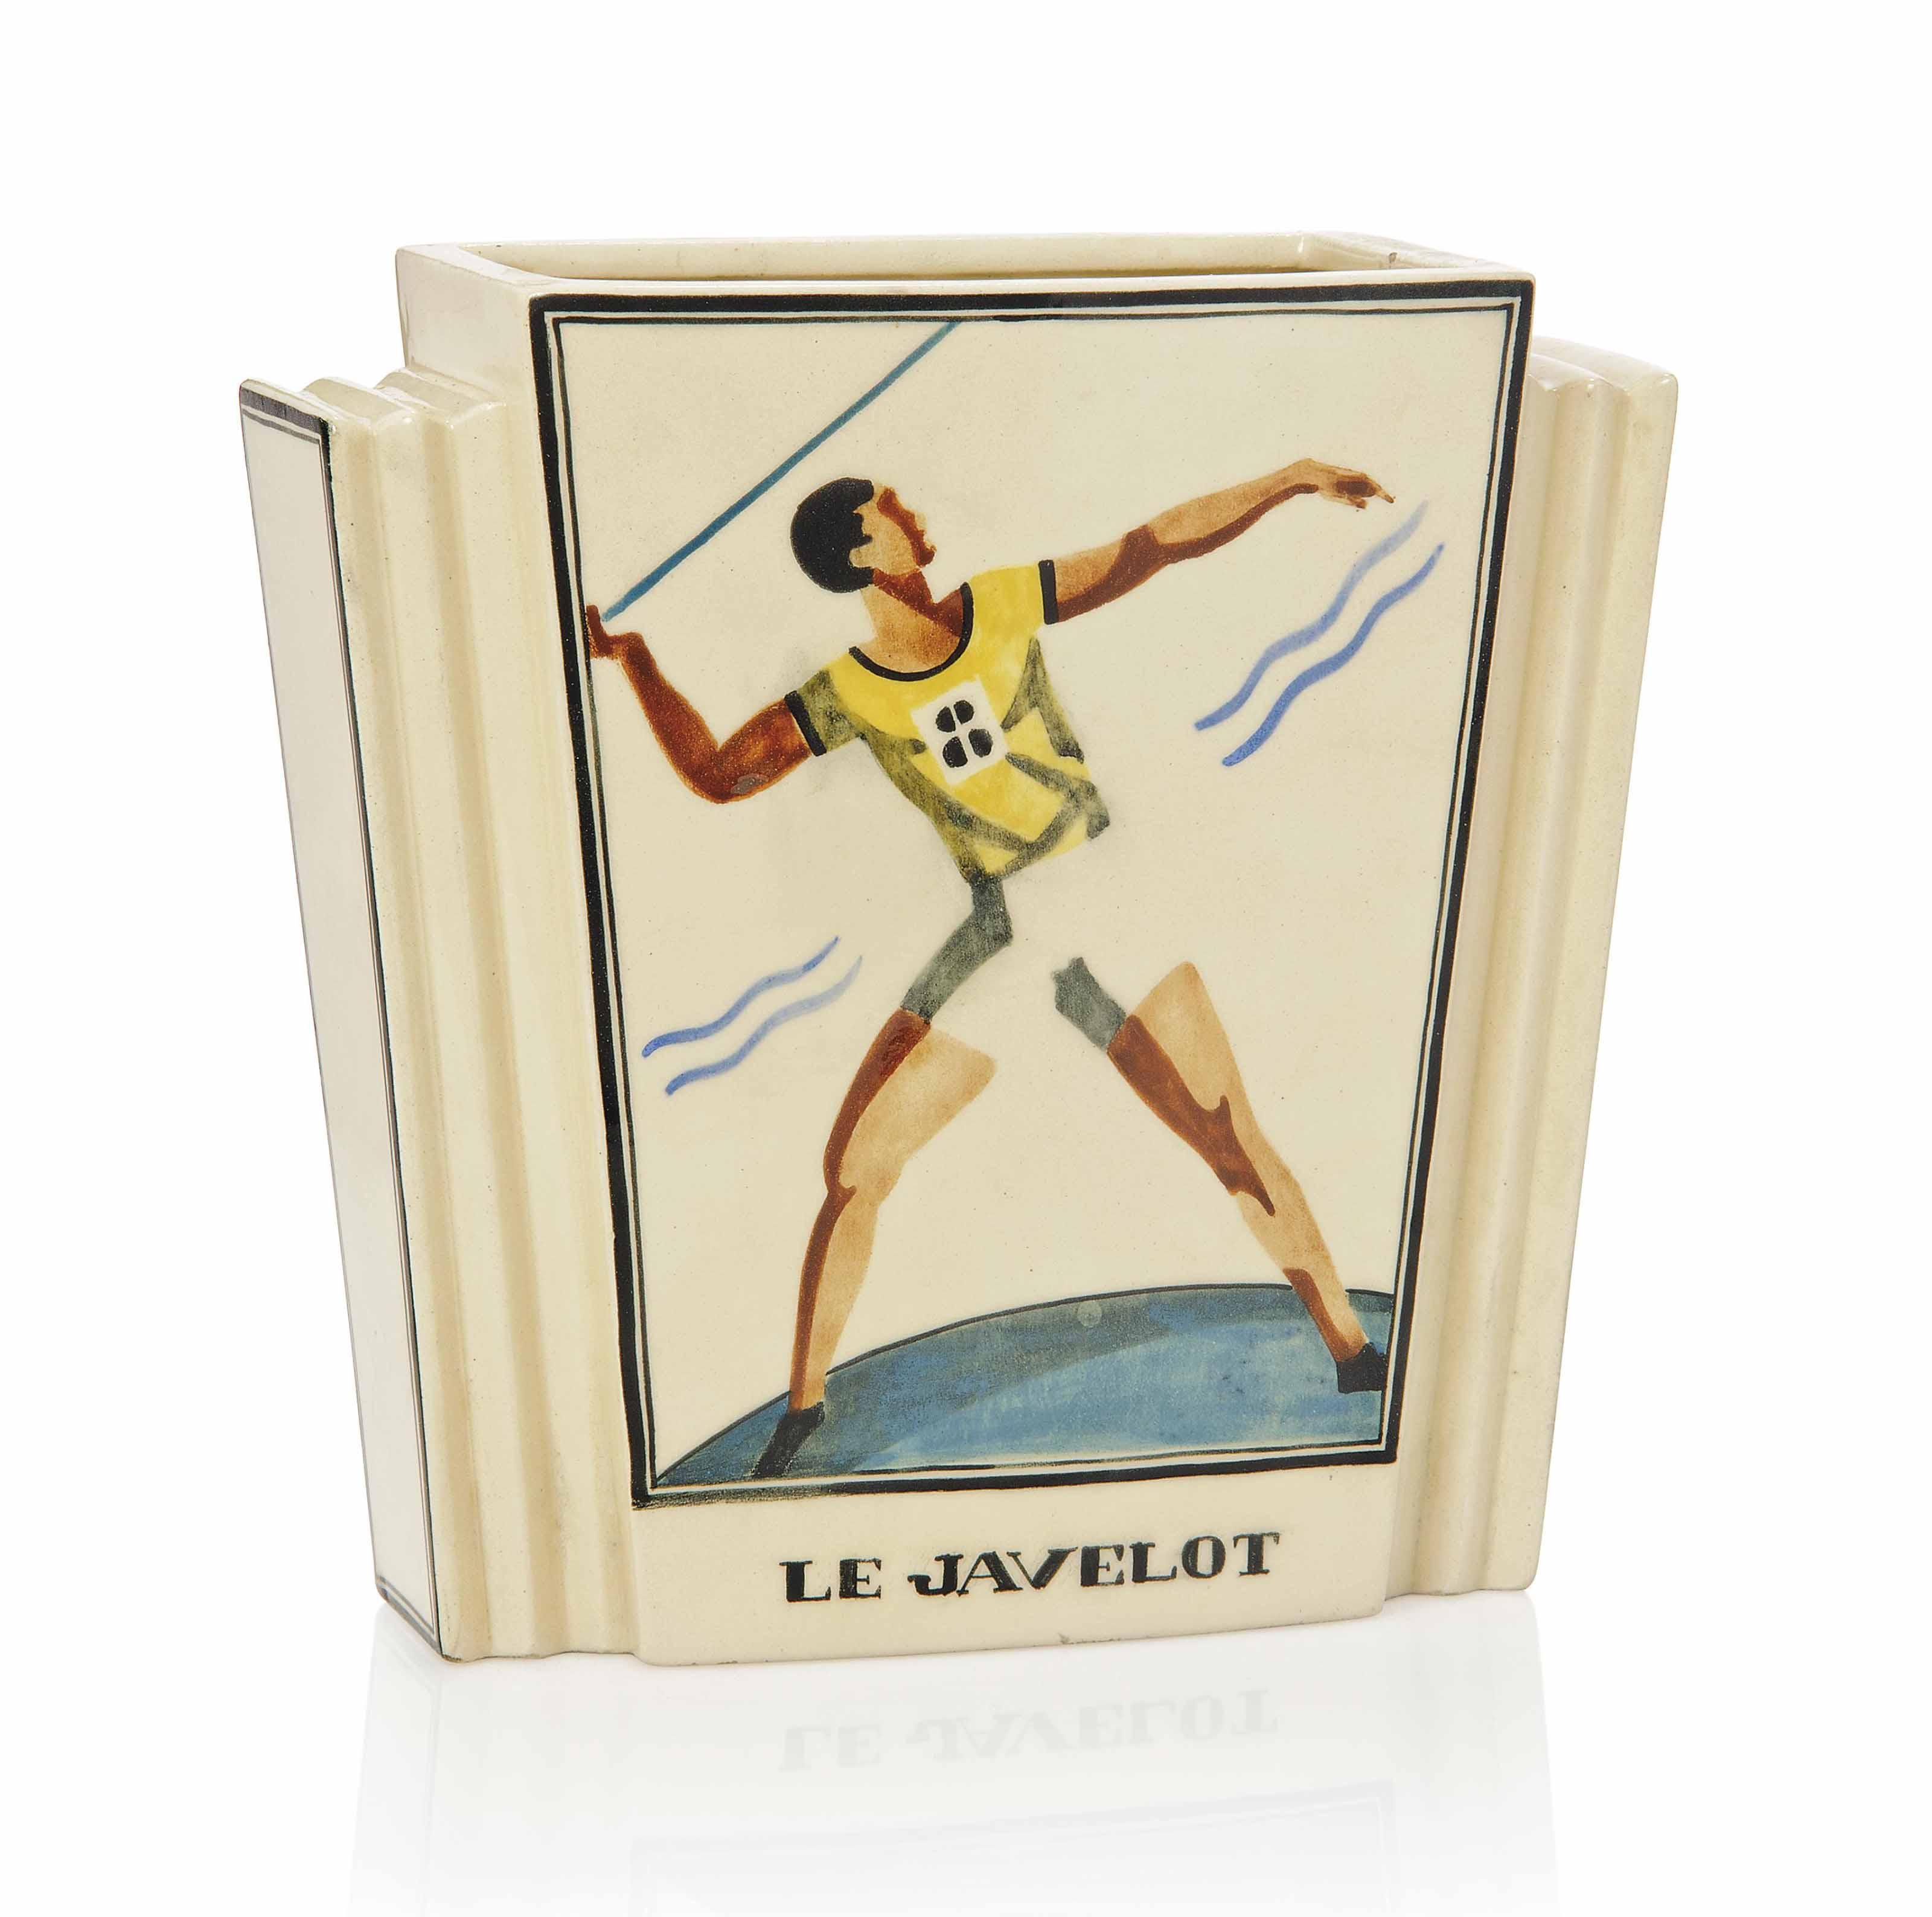 'LE JAVELOT', A ROBERT LALLEMANT (1902-1954) EARTHENWARE VASE